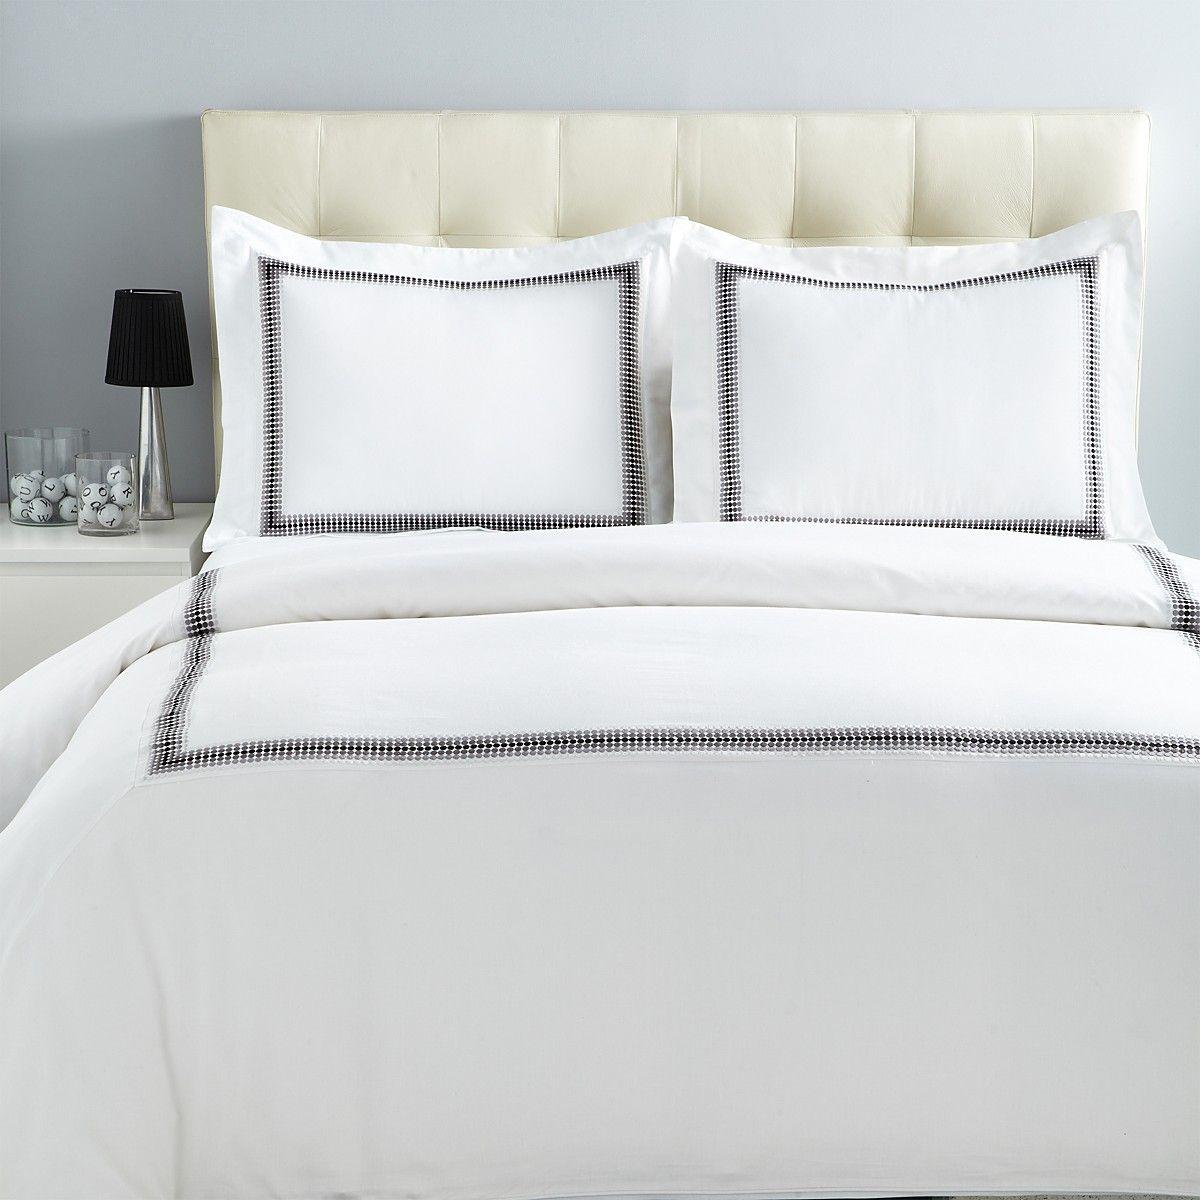 Raymond Waites Bedding Comforter Sets Luxurious Bedrooms Bed